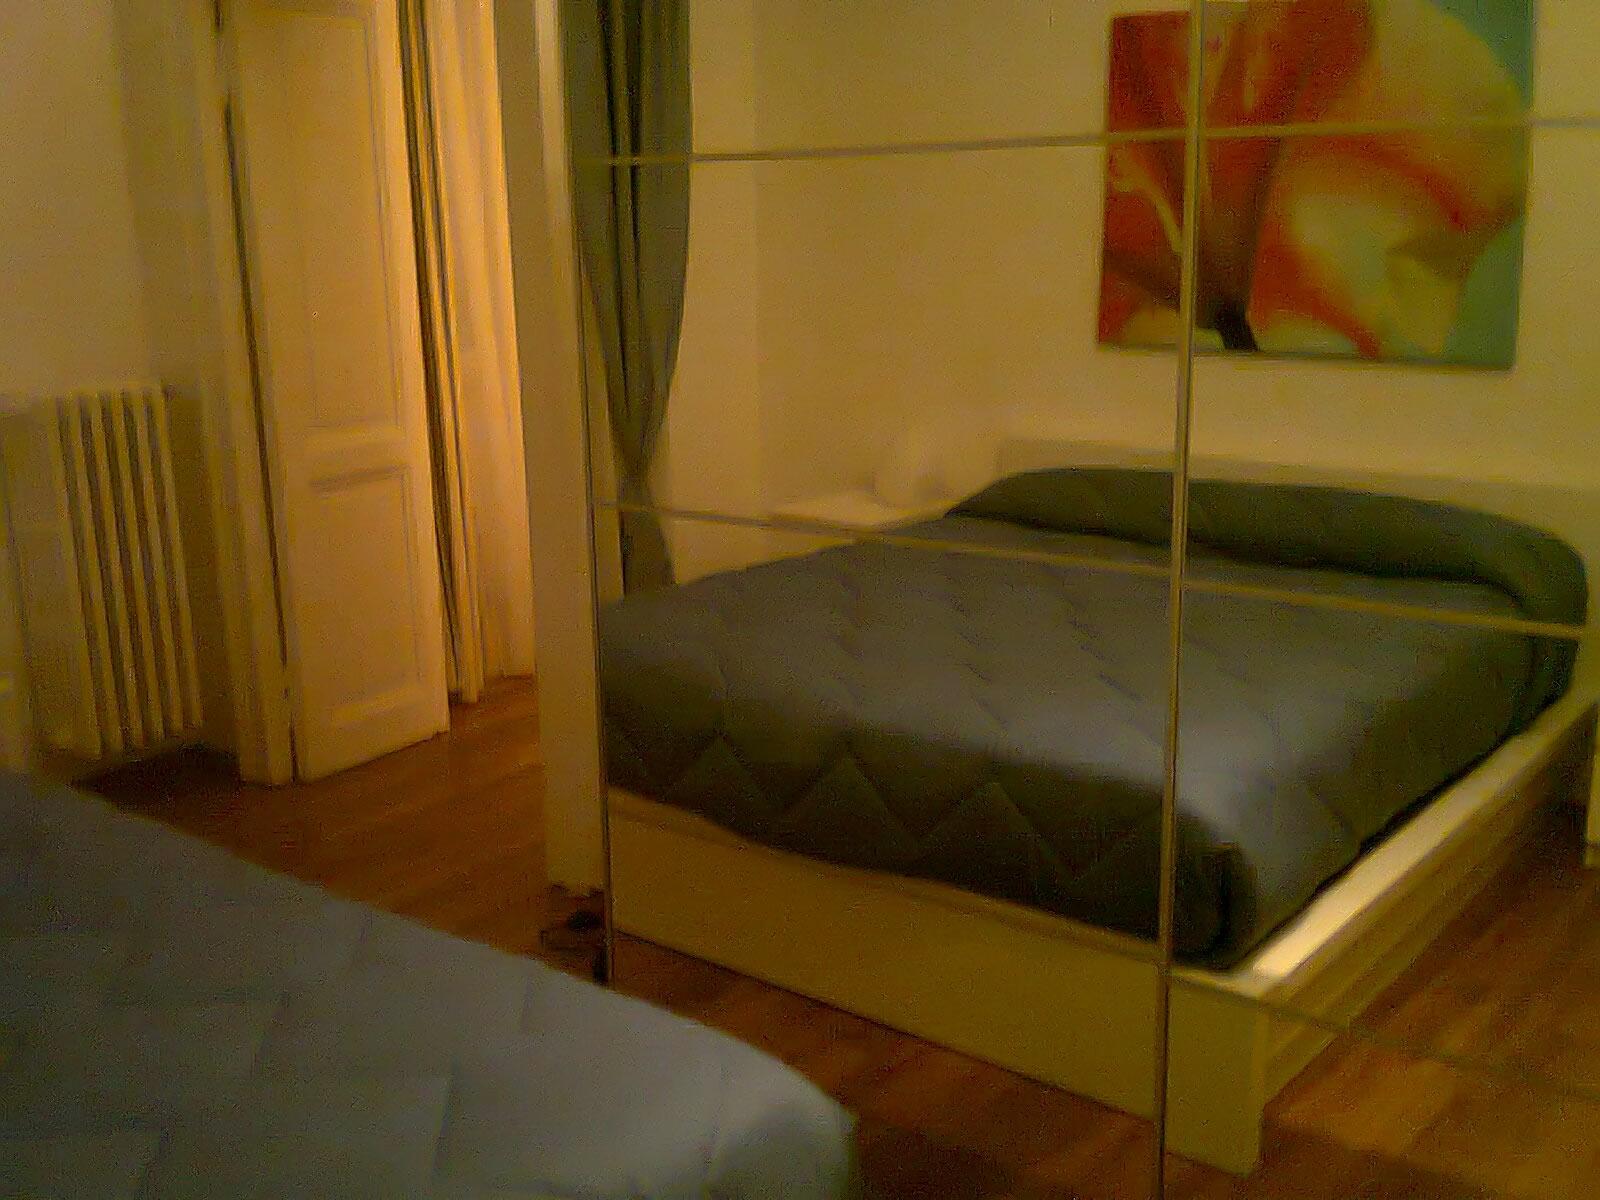 affitto casa vacanze citta roma 8086 (20130307110332-2013-19062-NDP.jpg)